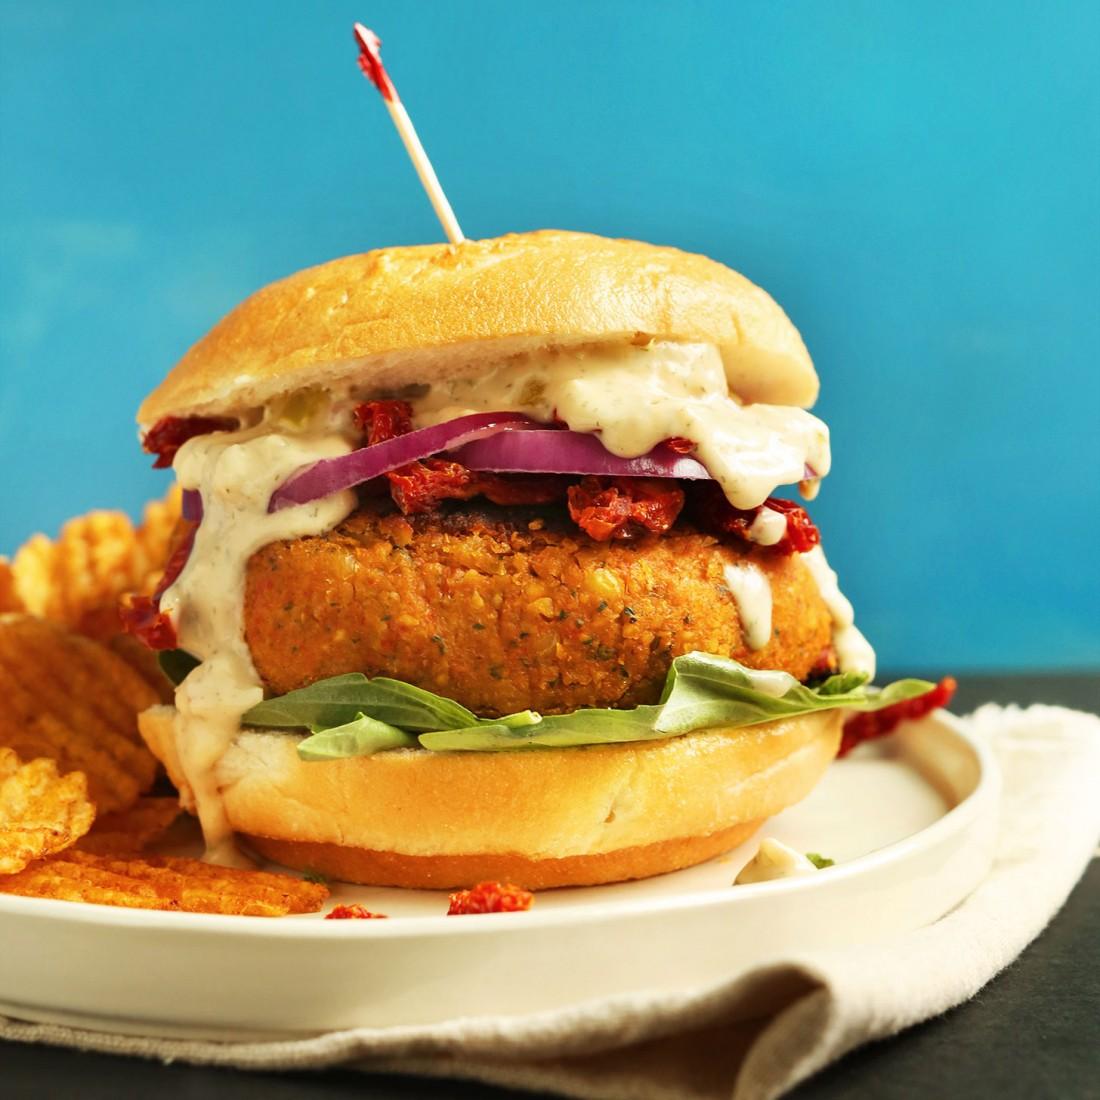 Sundried Tomato Chickpea Burger